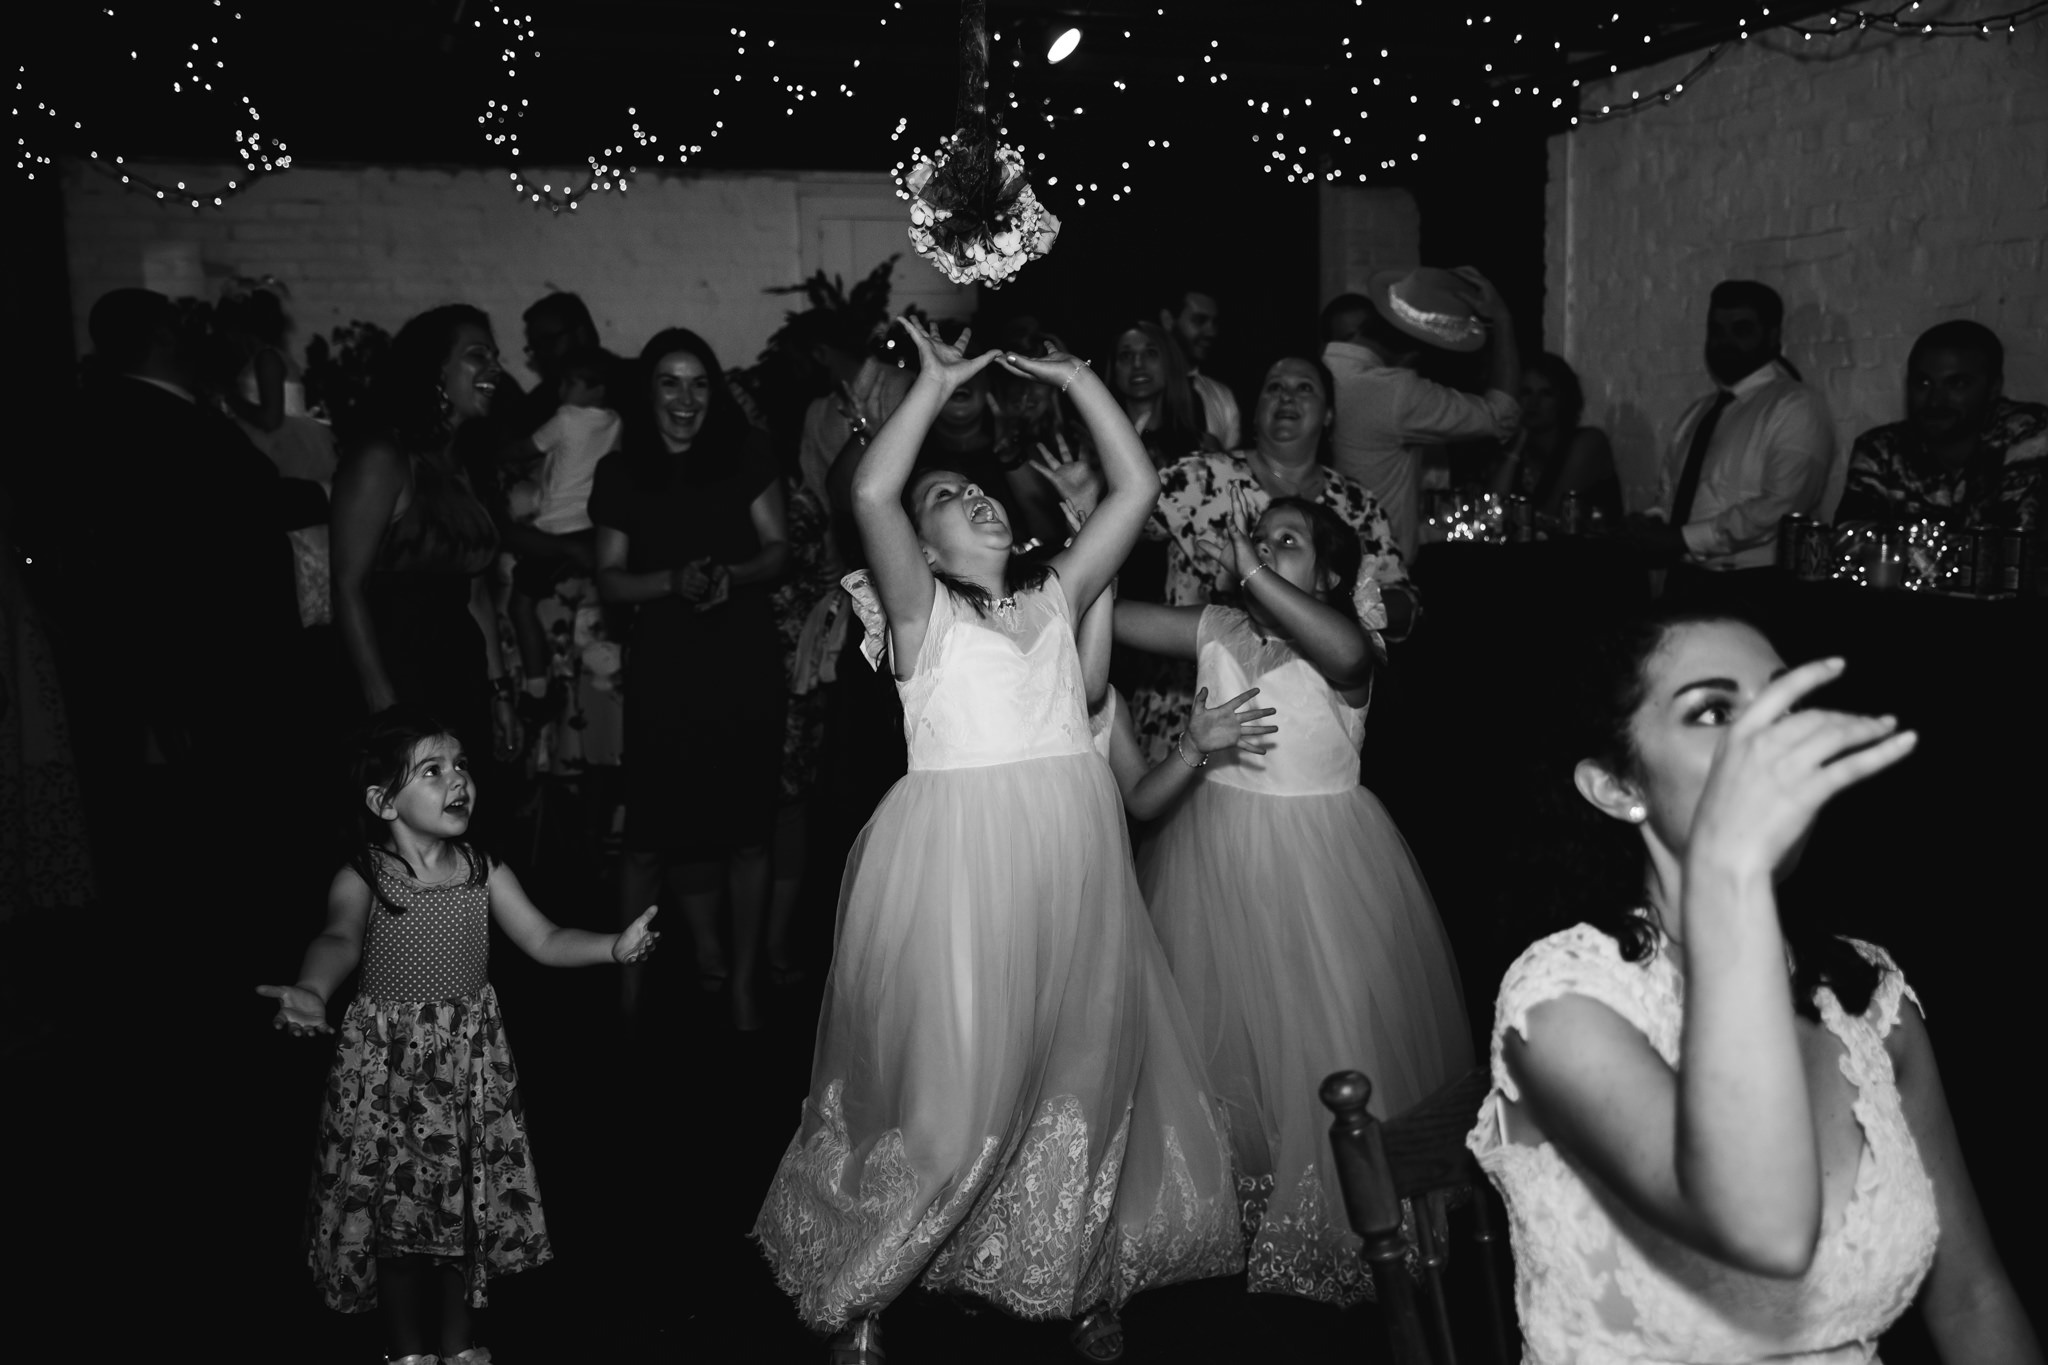 woodruff-fontaine-wedding-venue-memphis-thewarmtharoundyou-brenda-taylor-53.jpg